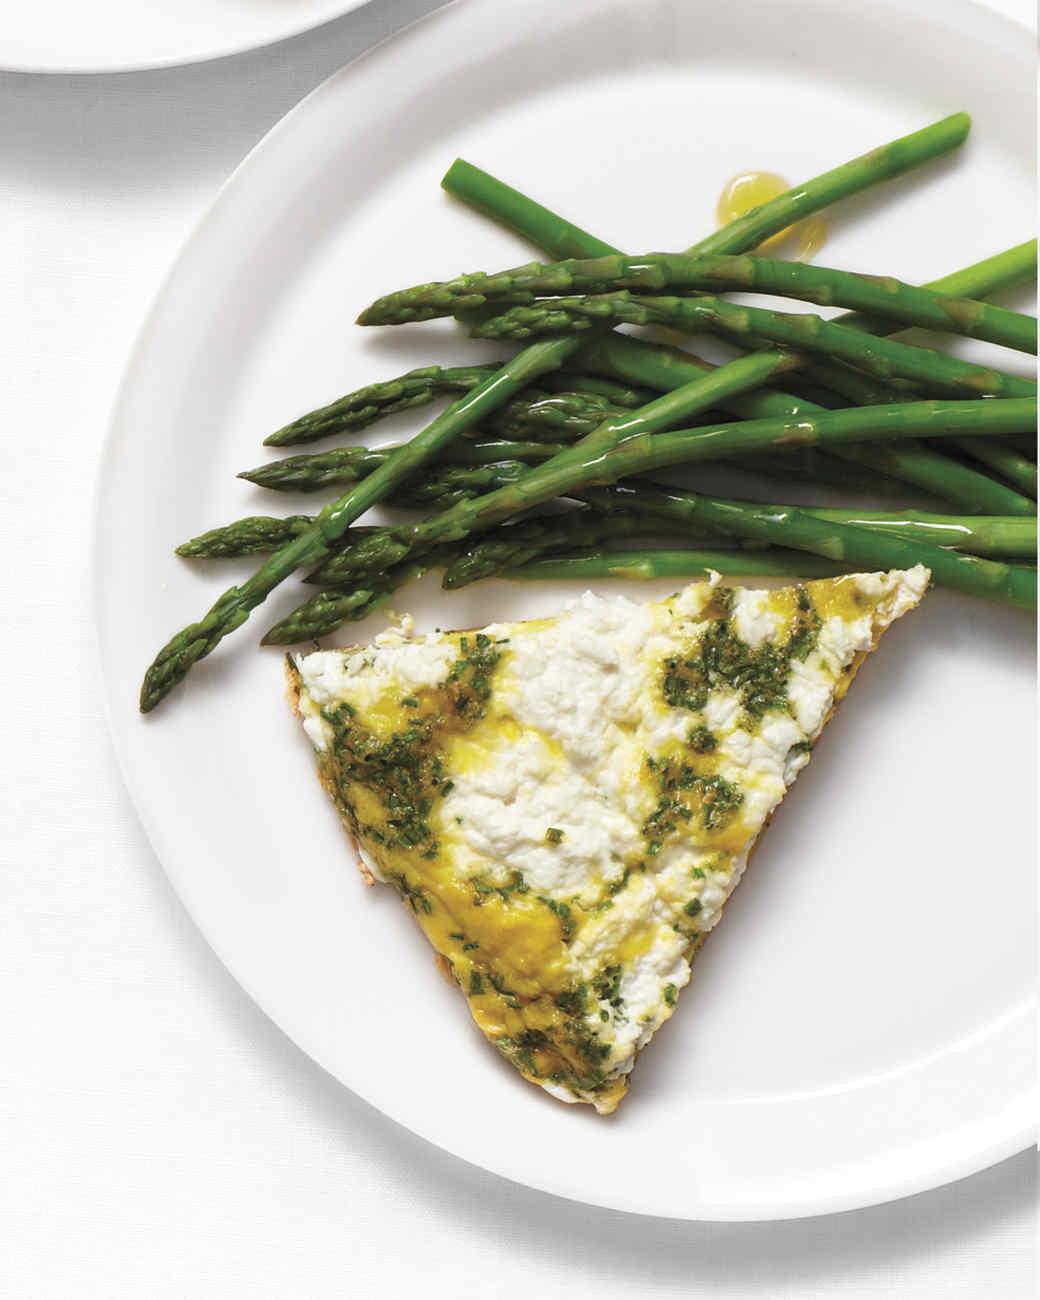 frittata-asparagus-med107287.jpg